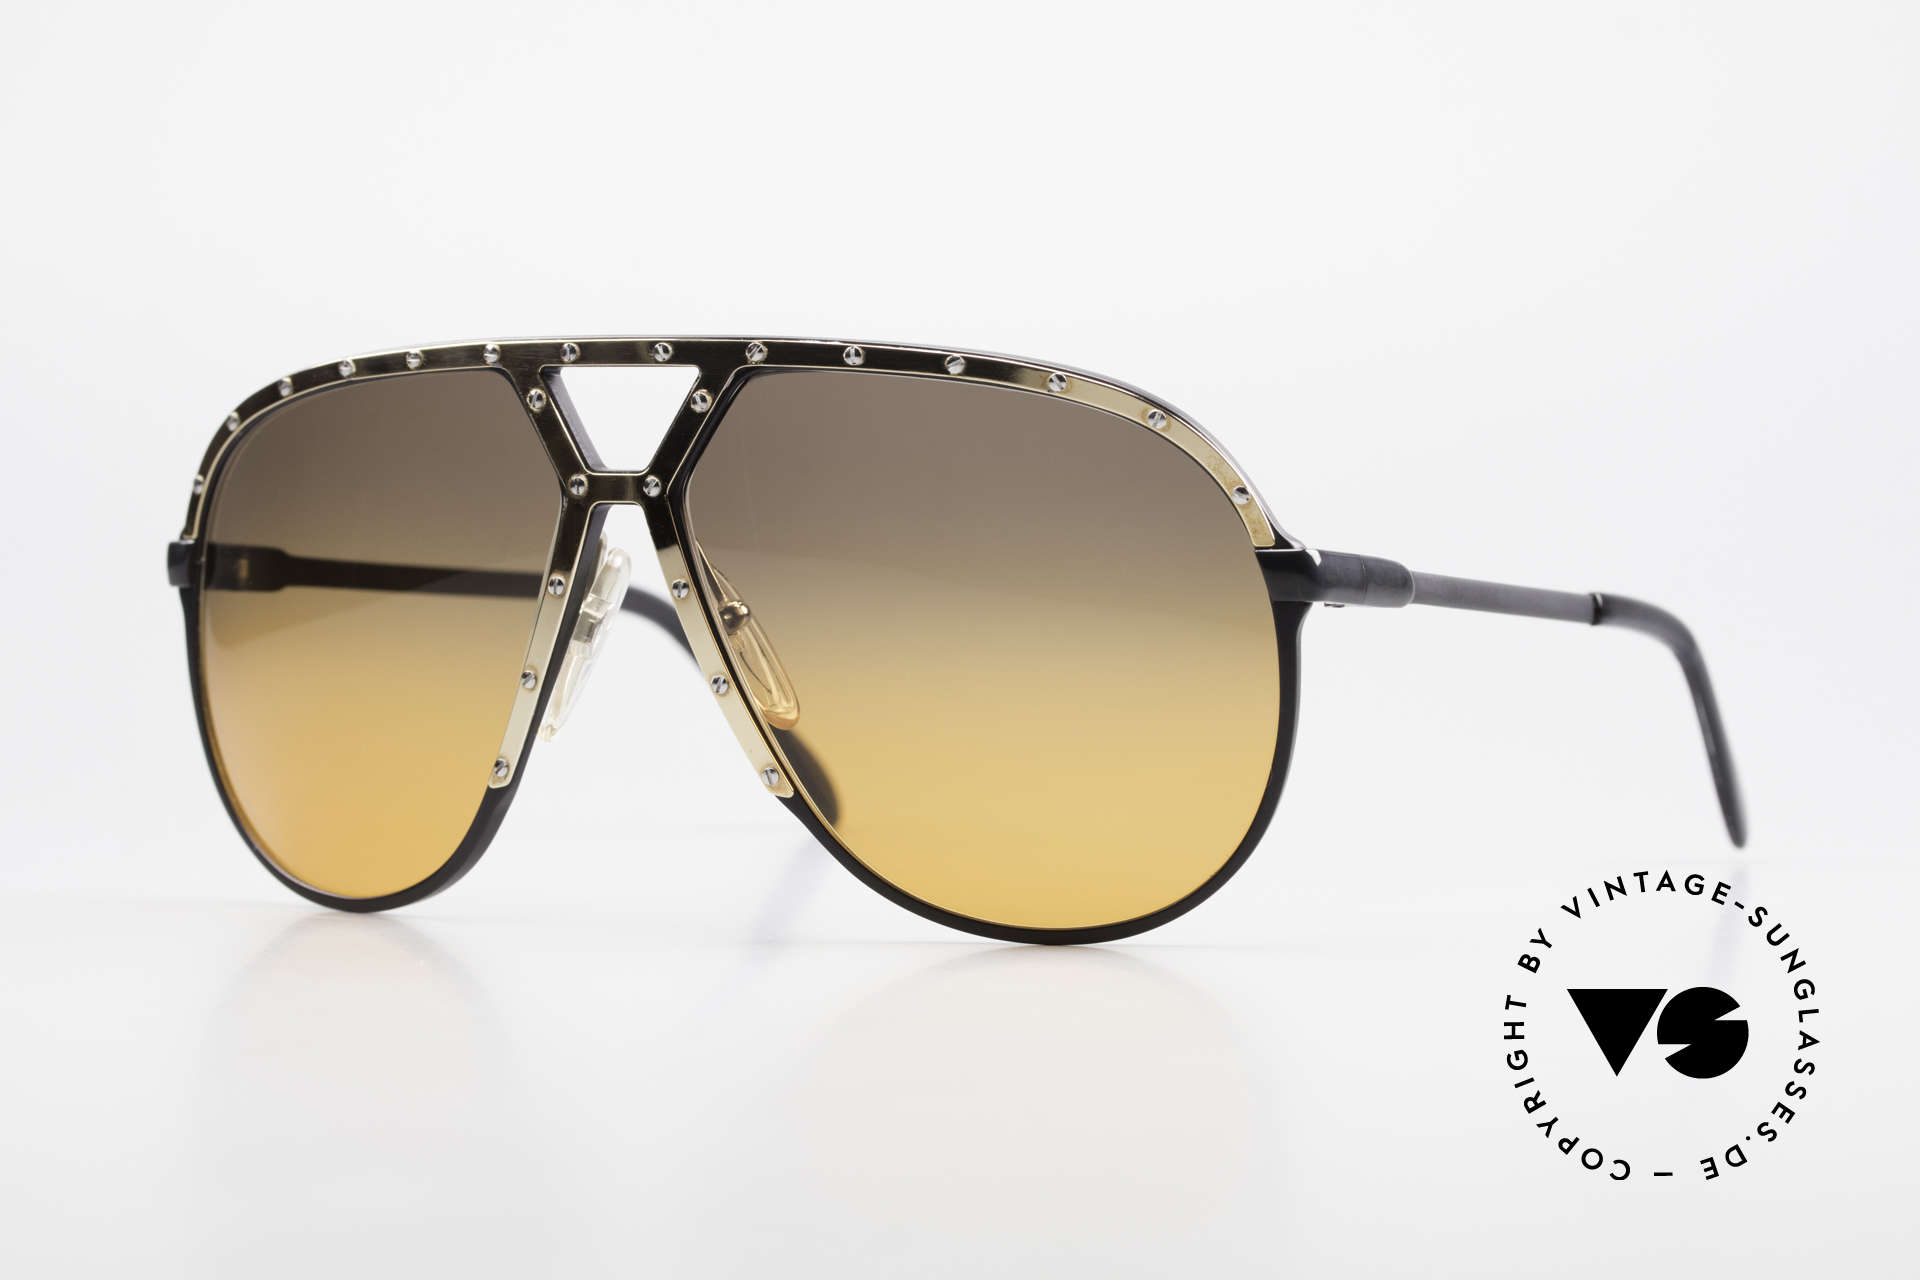 Alpina M1 80er XL Aviator Sonnenbrille, 80er W. Germany Aviator Sonnenbrille, Alpina M1, Passend für Herren